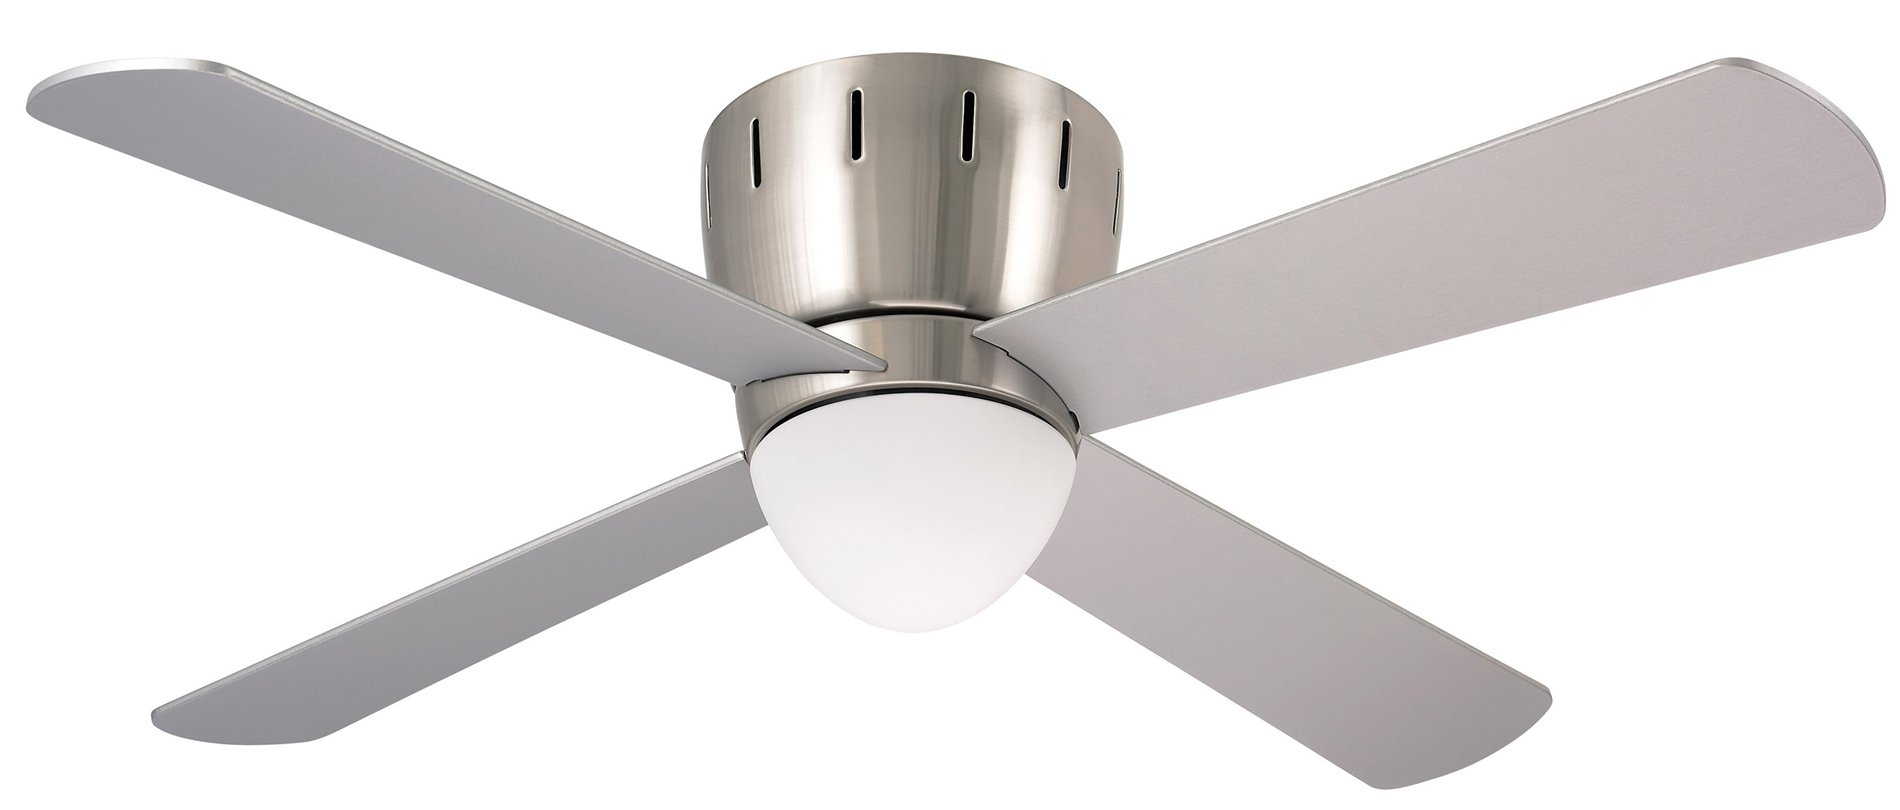 Emerson CF530BS 48 Wyatt Modern  Contemporary Flush Mount Ceiling Fan EMCF530BS